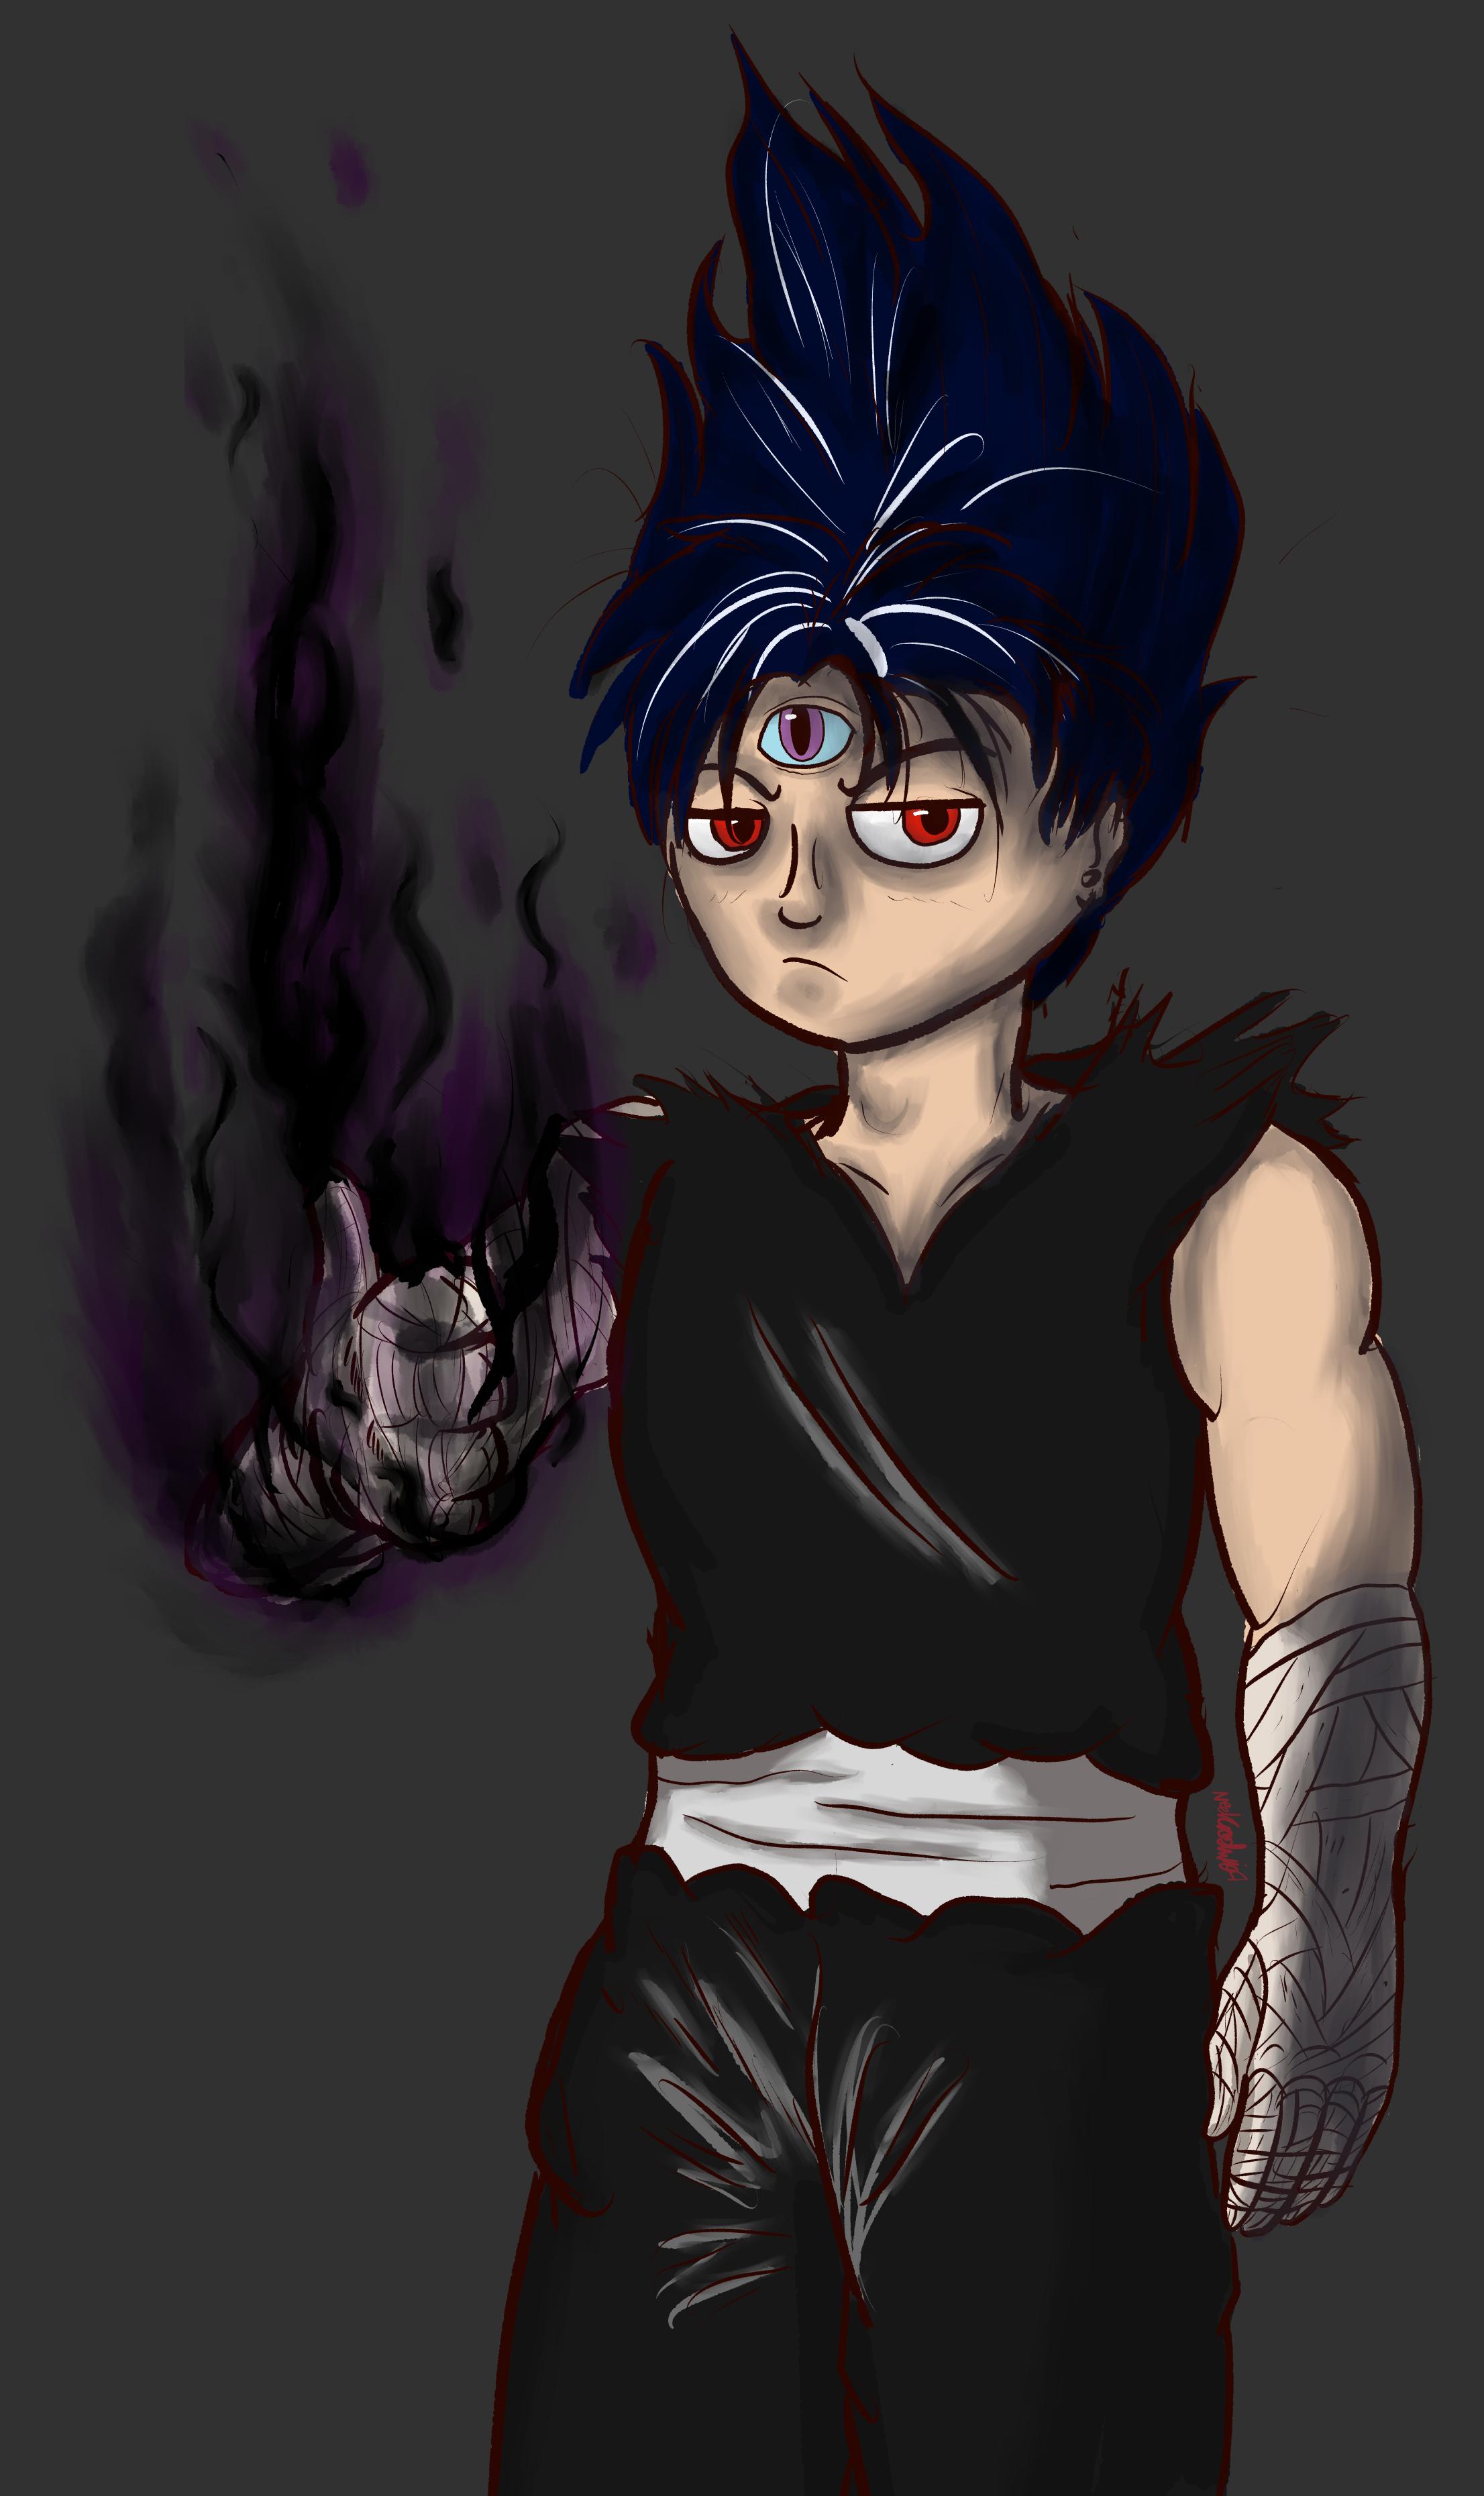 Edgy black fire